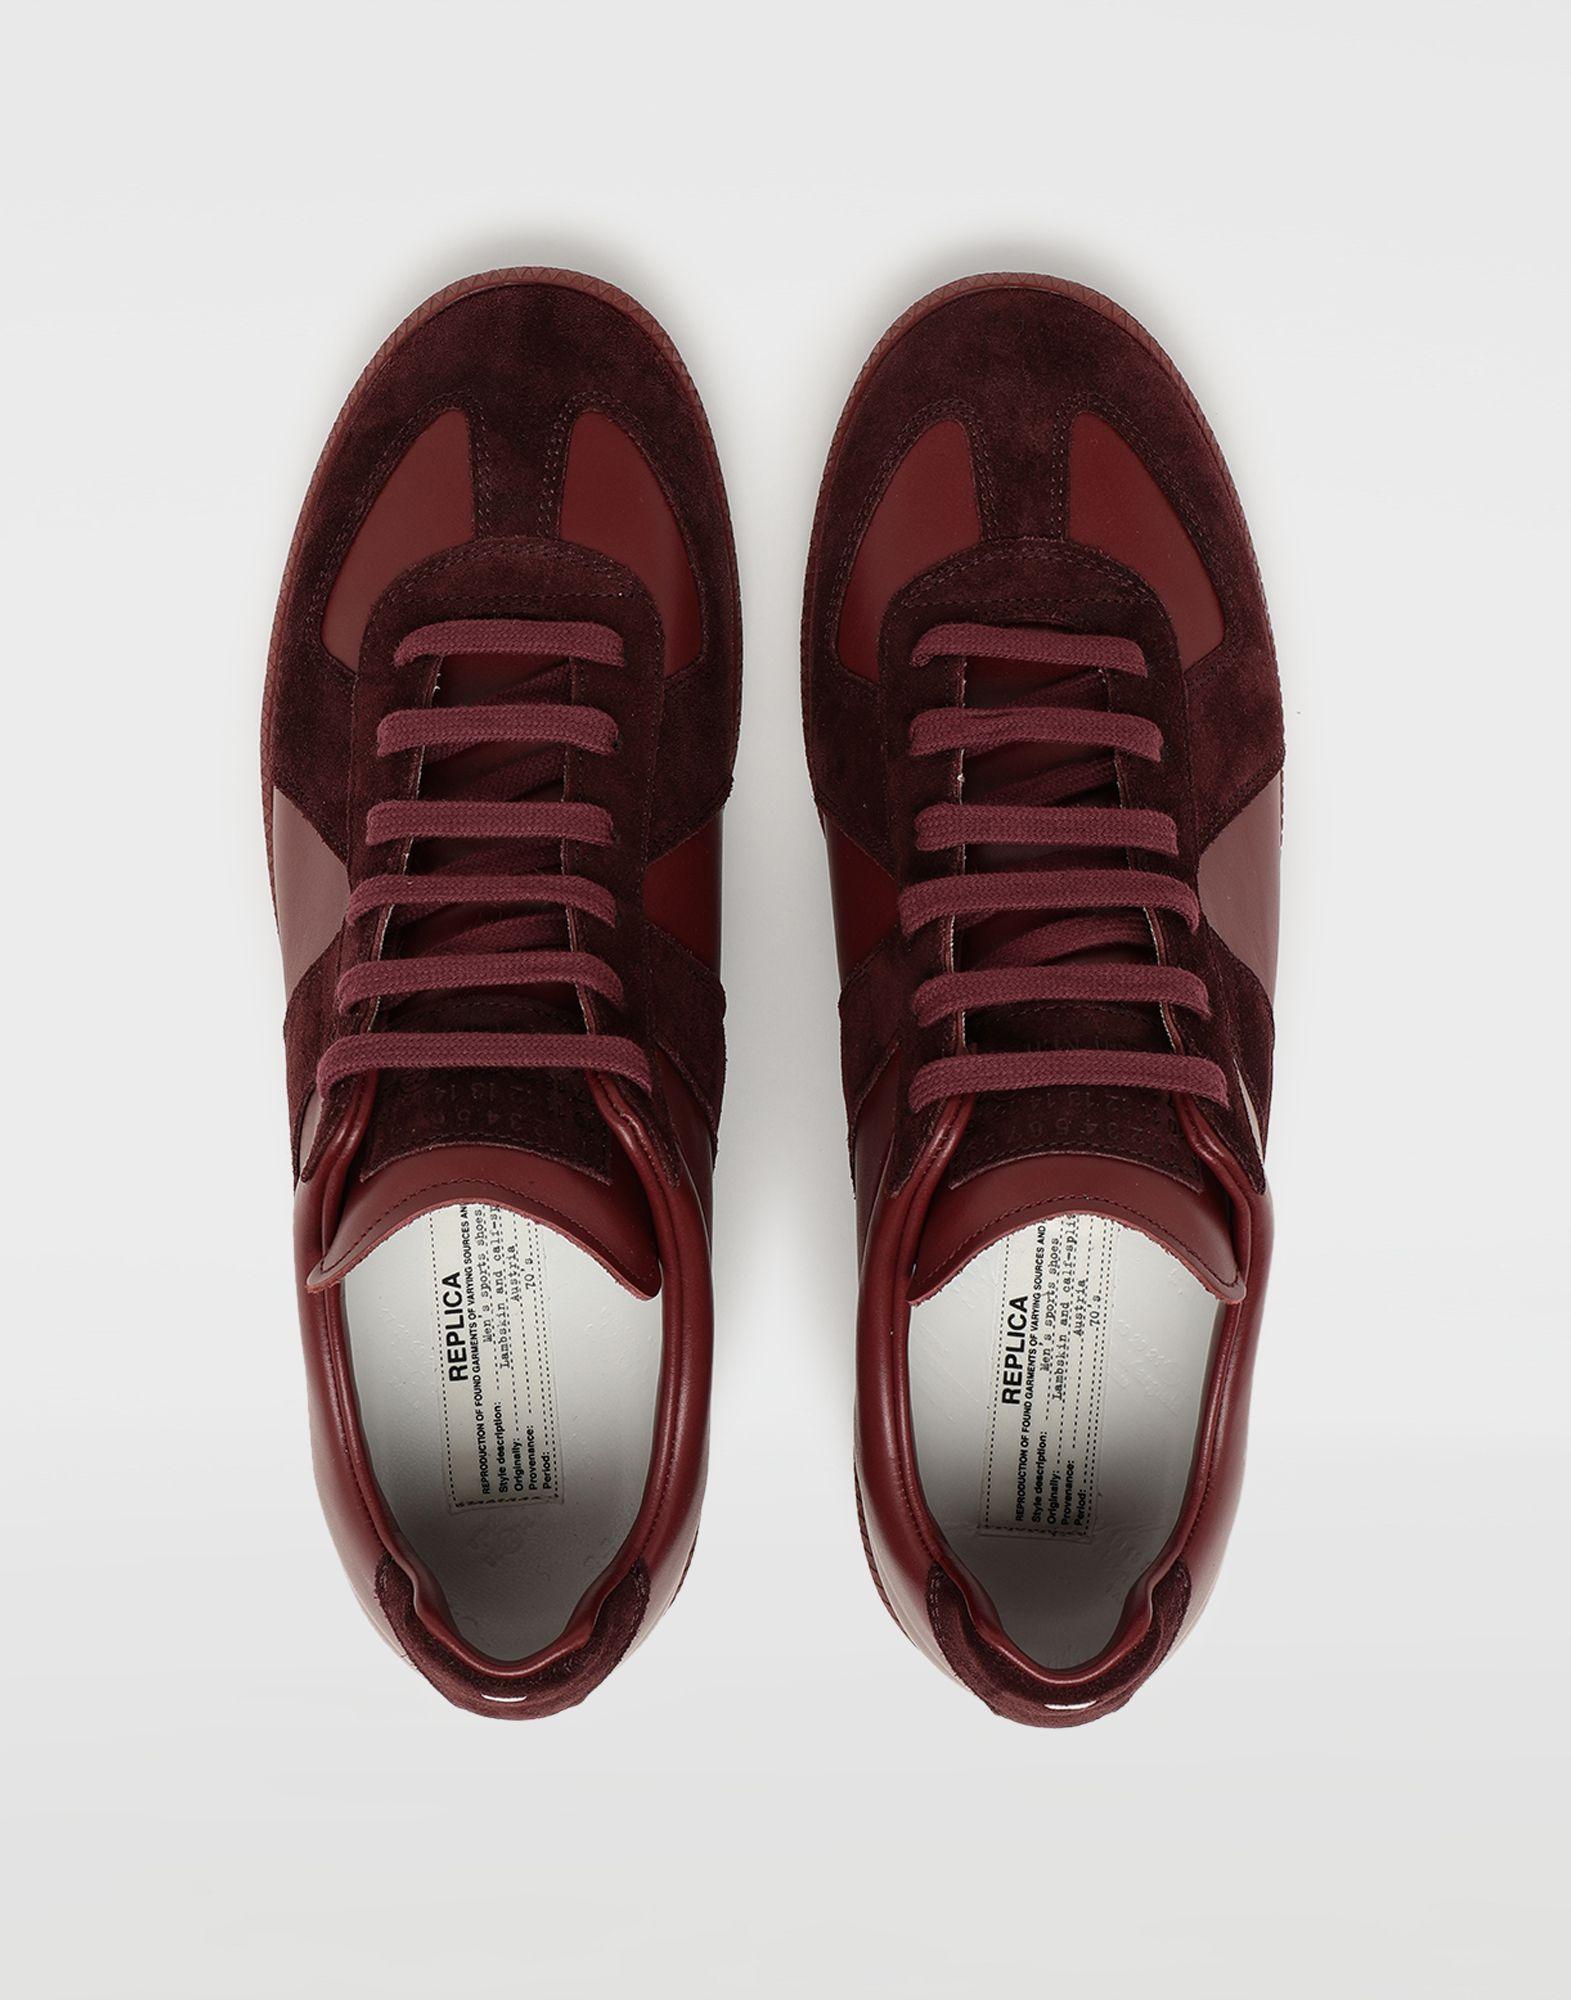 MAISON MARGIELA Replica low top sneakers Sneakers Man d